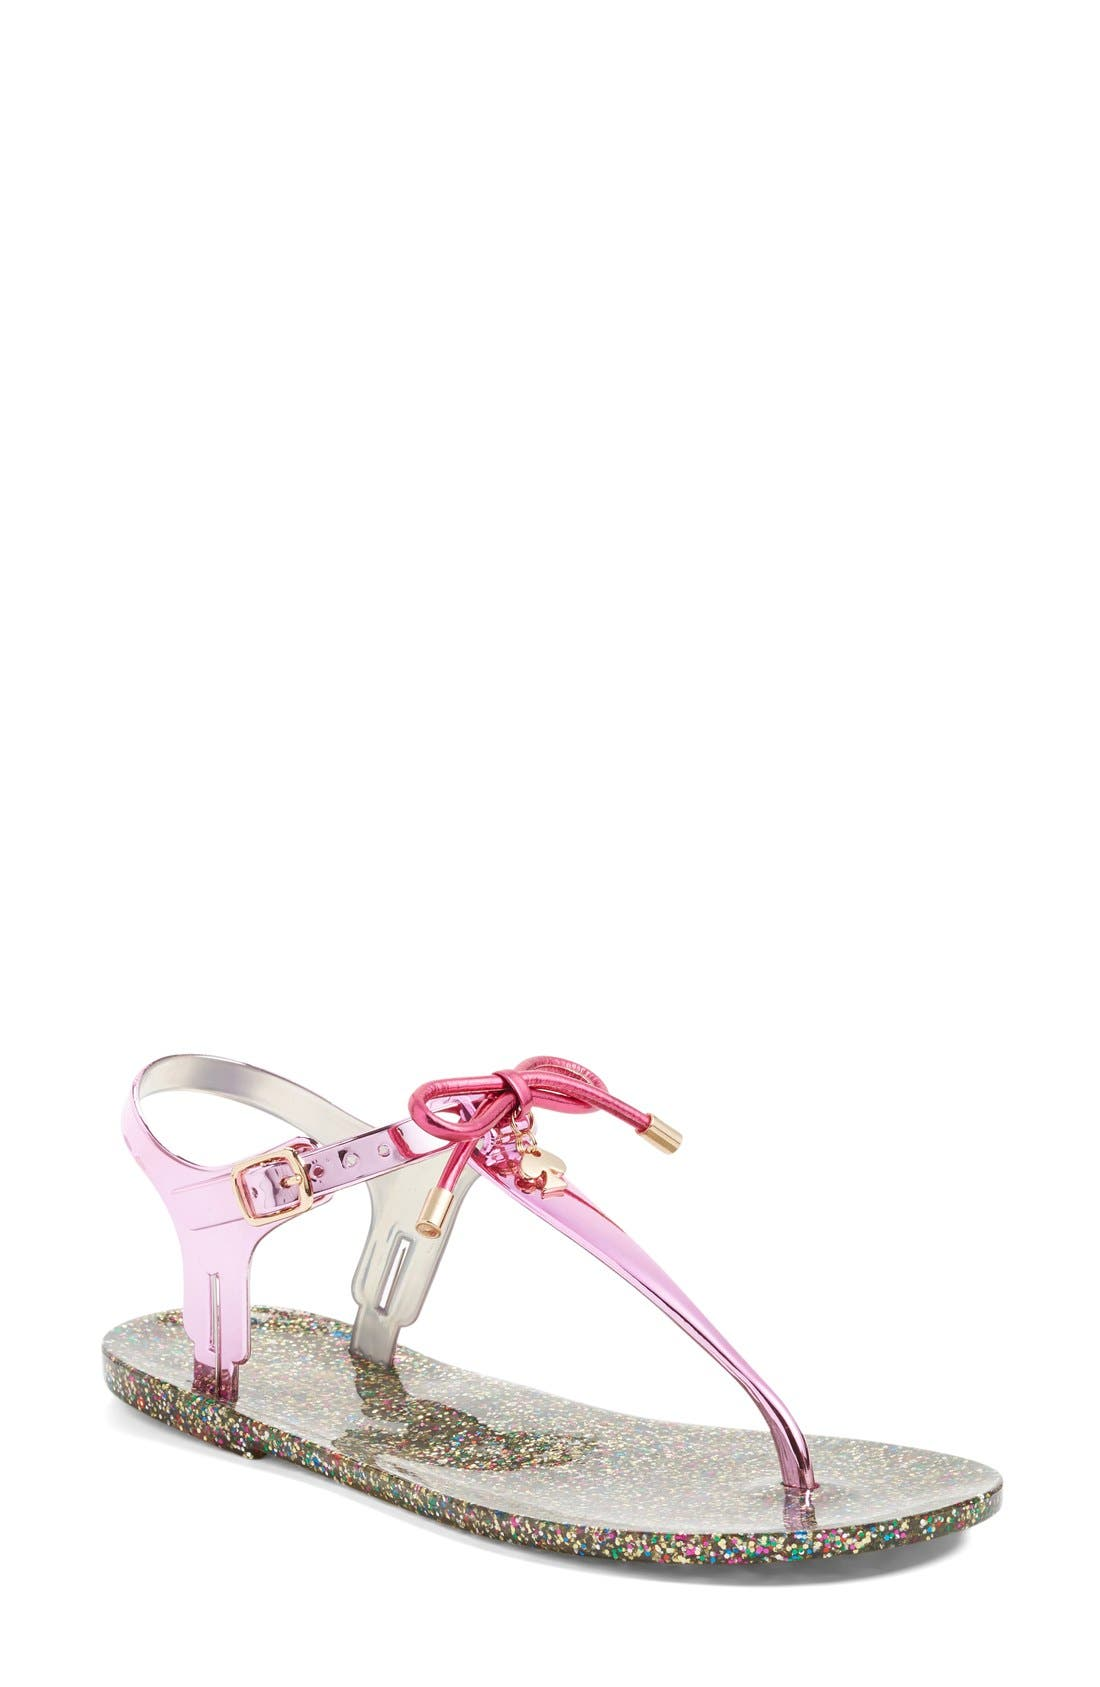 KATE SPADE NEW YORK fanley t-strap sandal